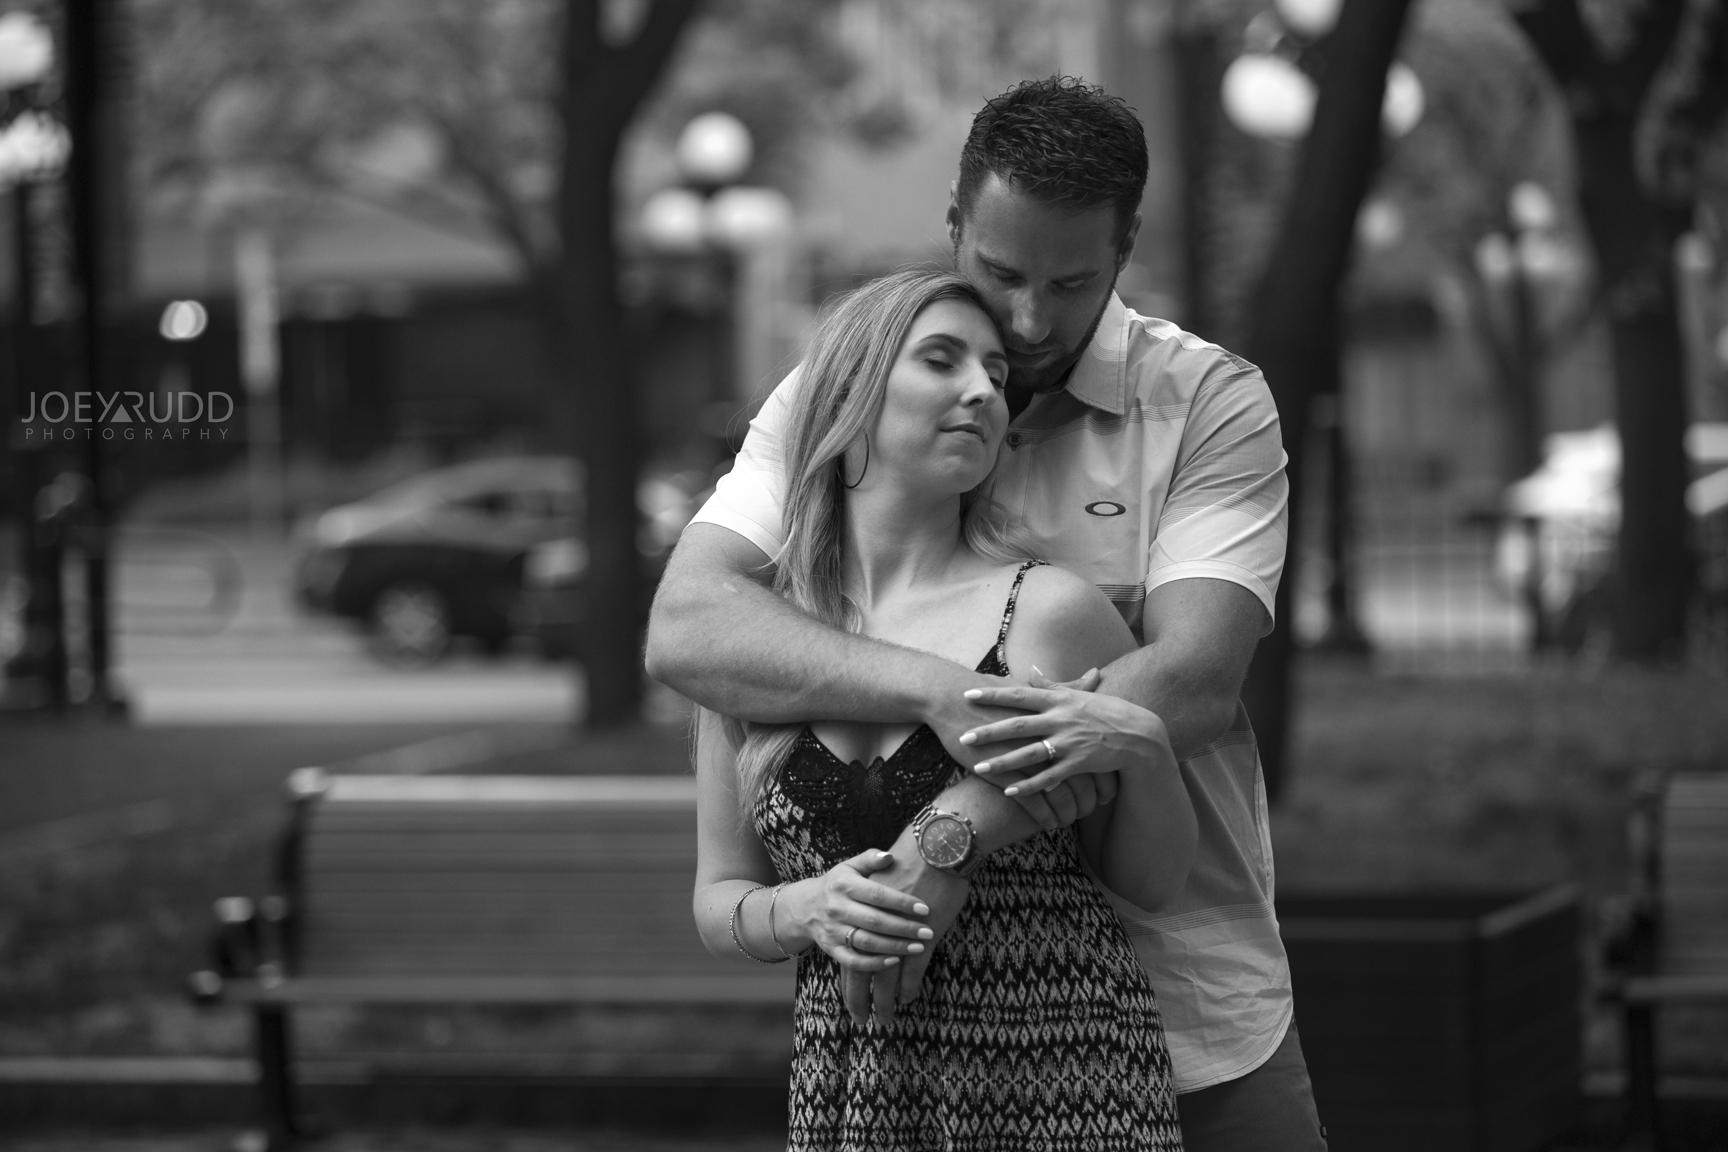 Joey Rudd Photography Ottawa Wedding Photographer Engagement Award Winning Photographer